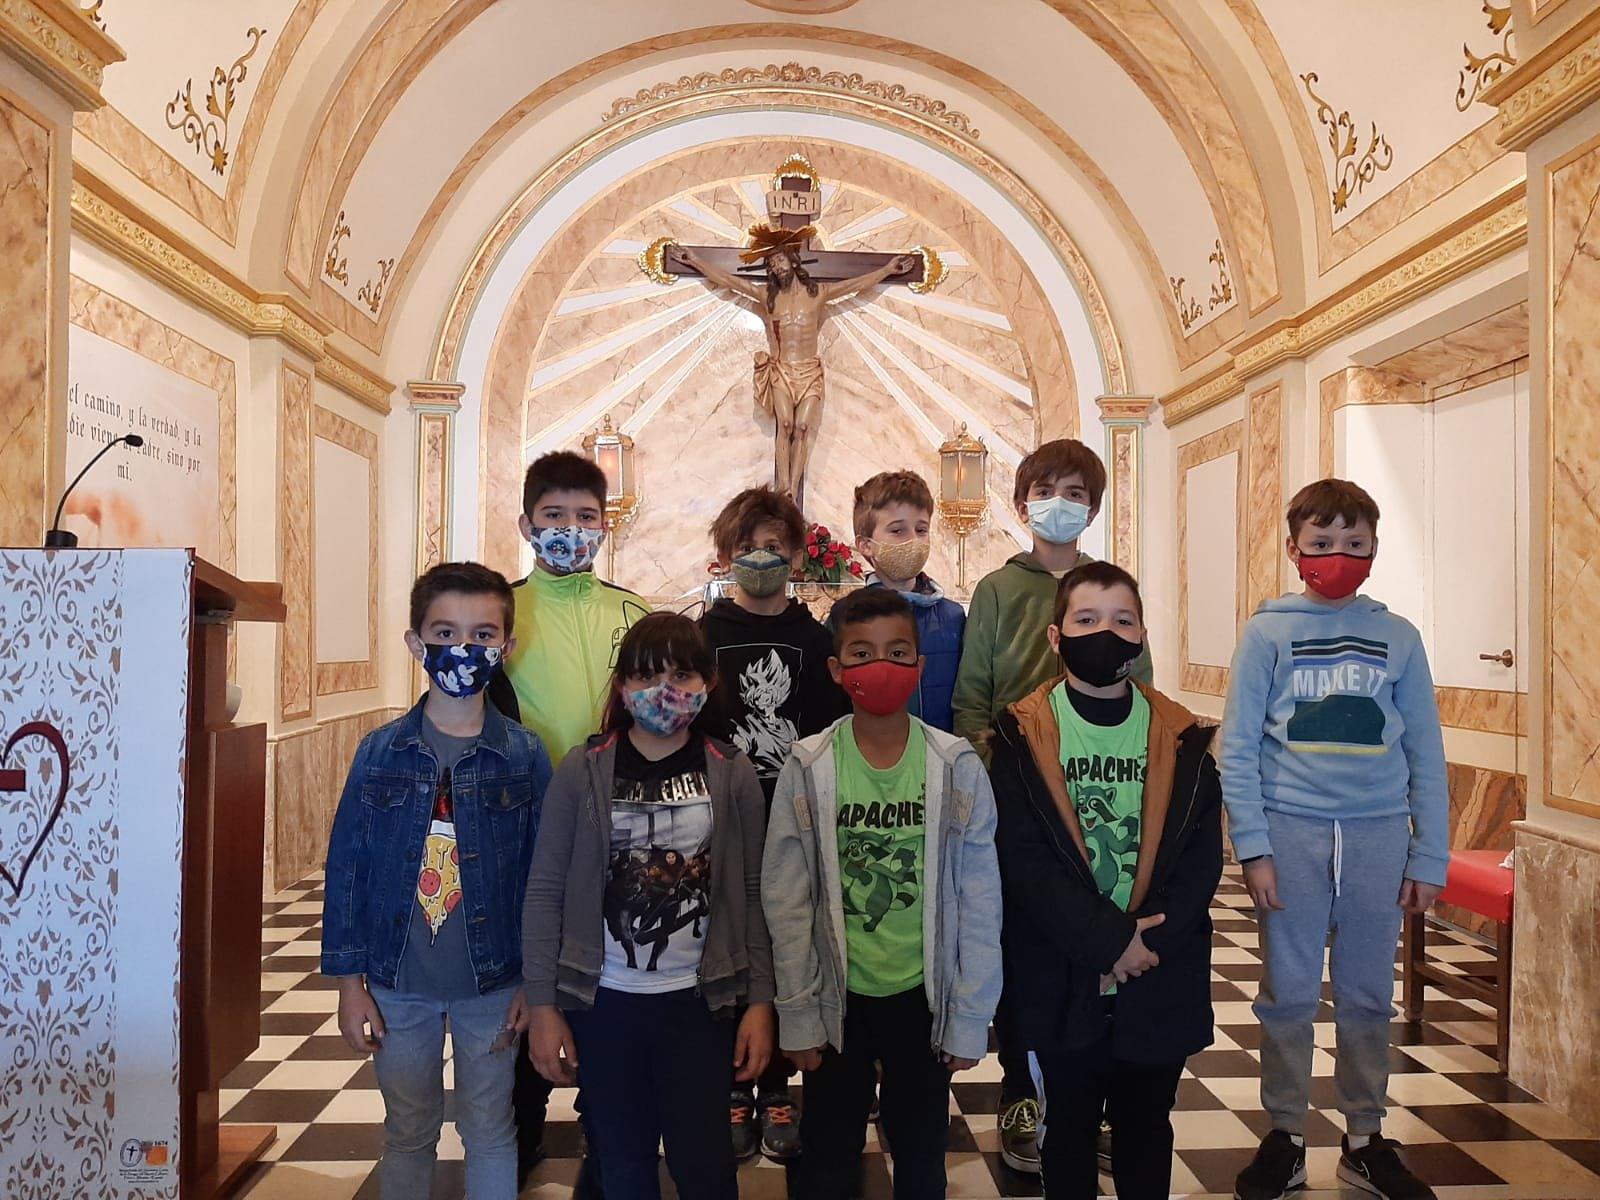 (2021-05-11) - Visita ermita alumnos Laura,3º B, Reina Sofia - Maria Isabel Berenquer Brotons - (03)